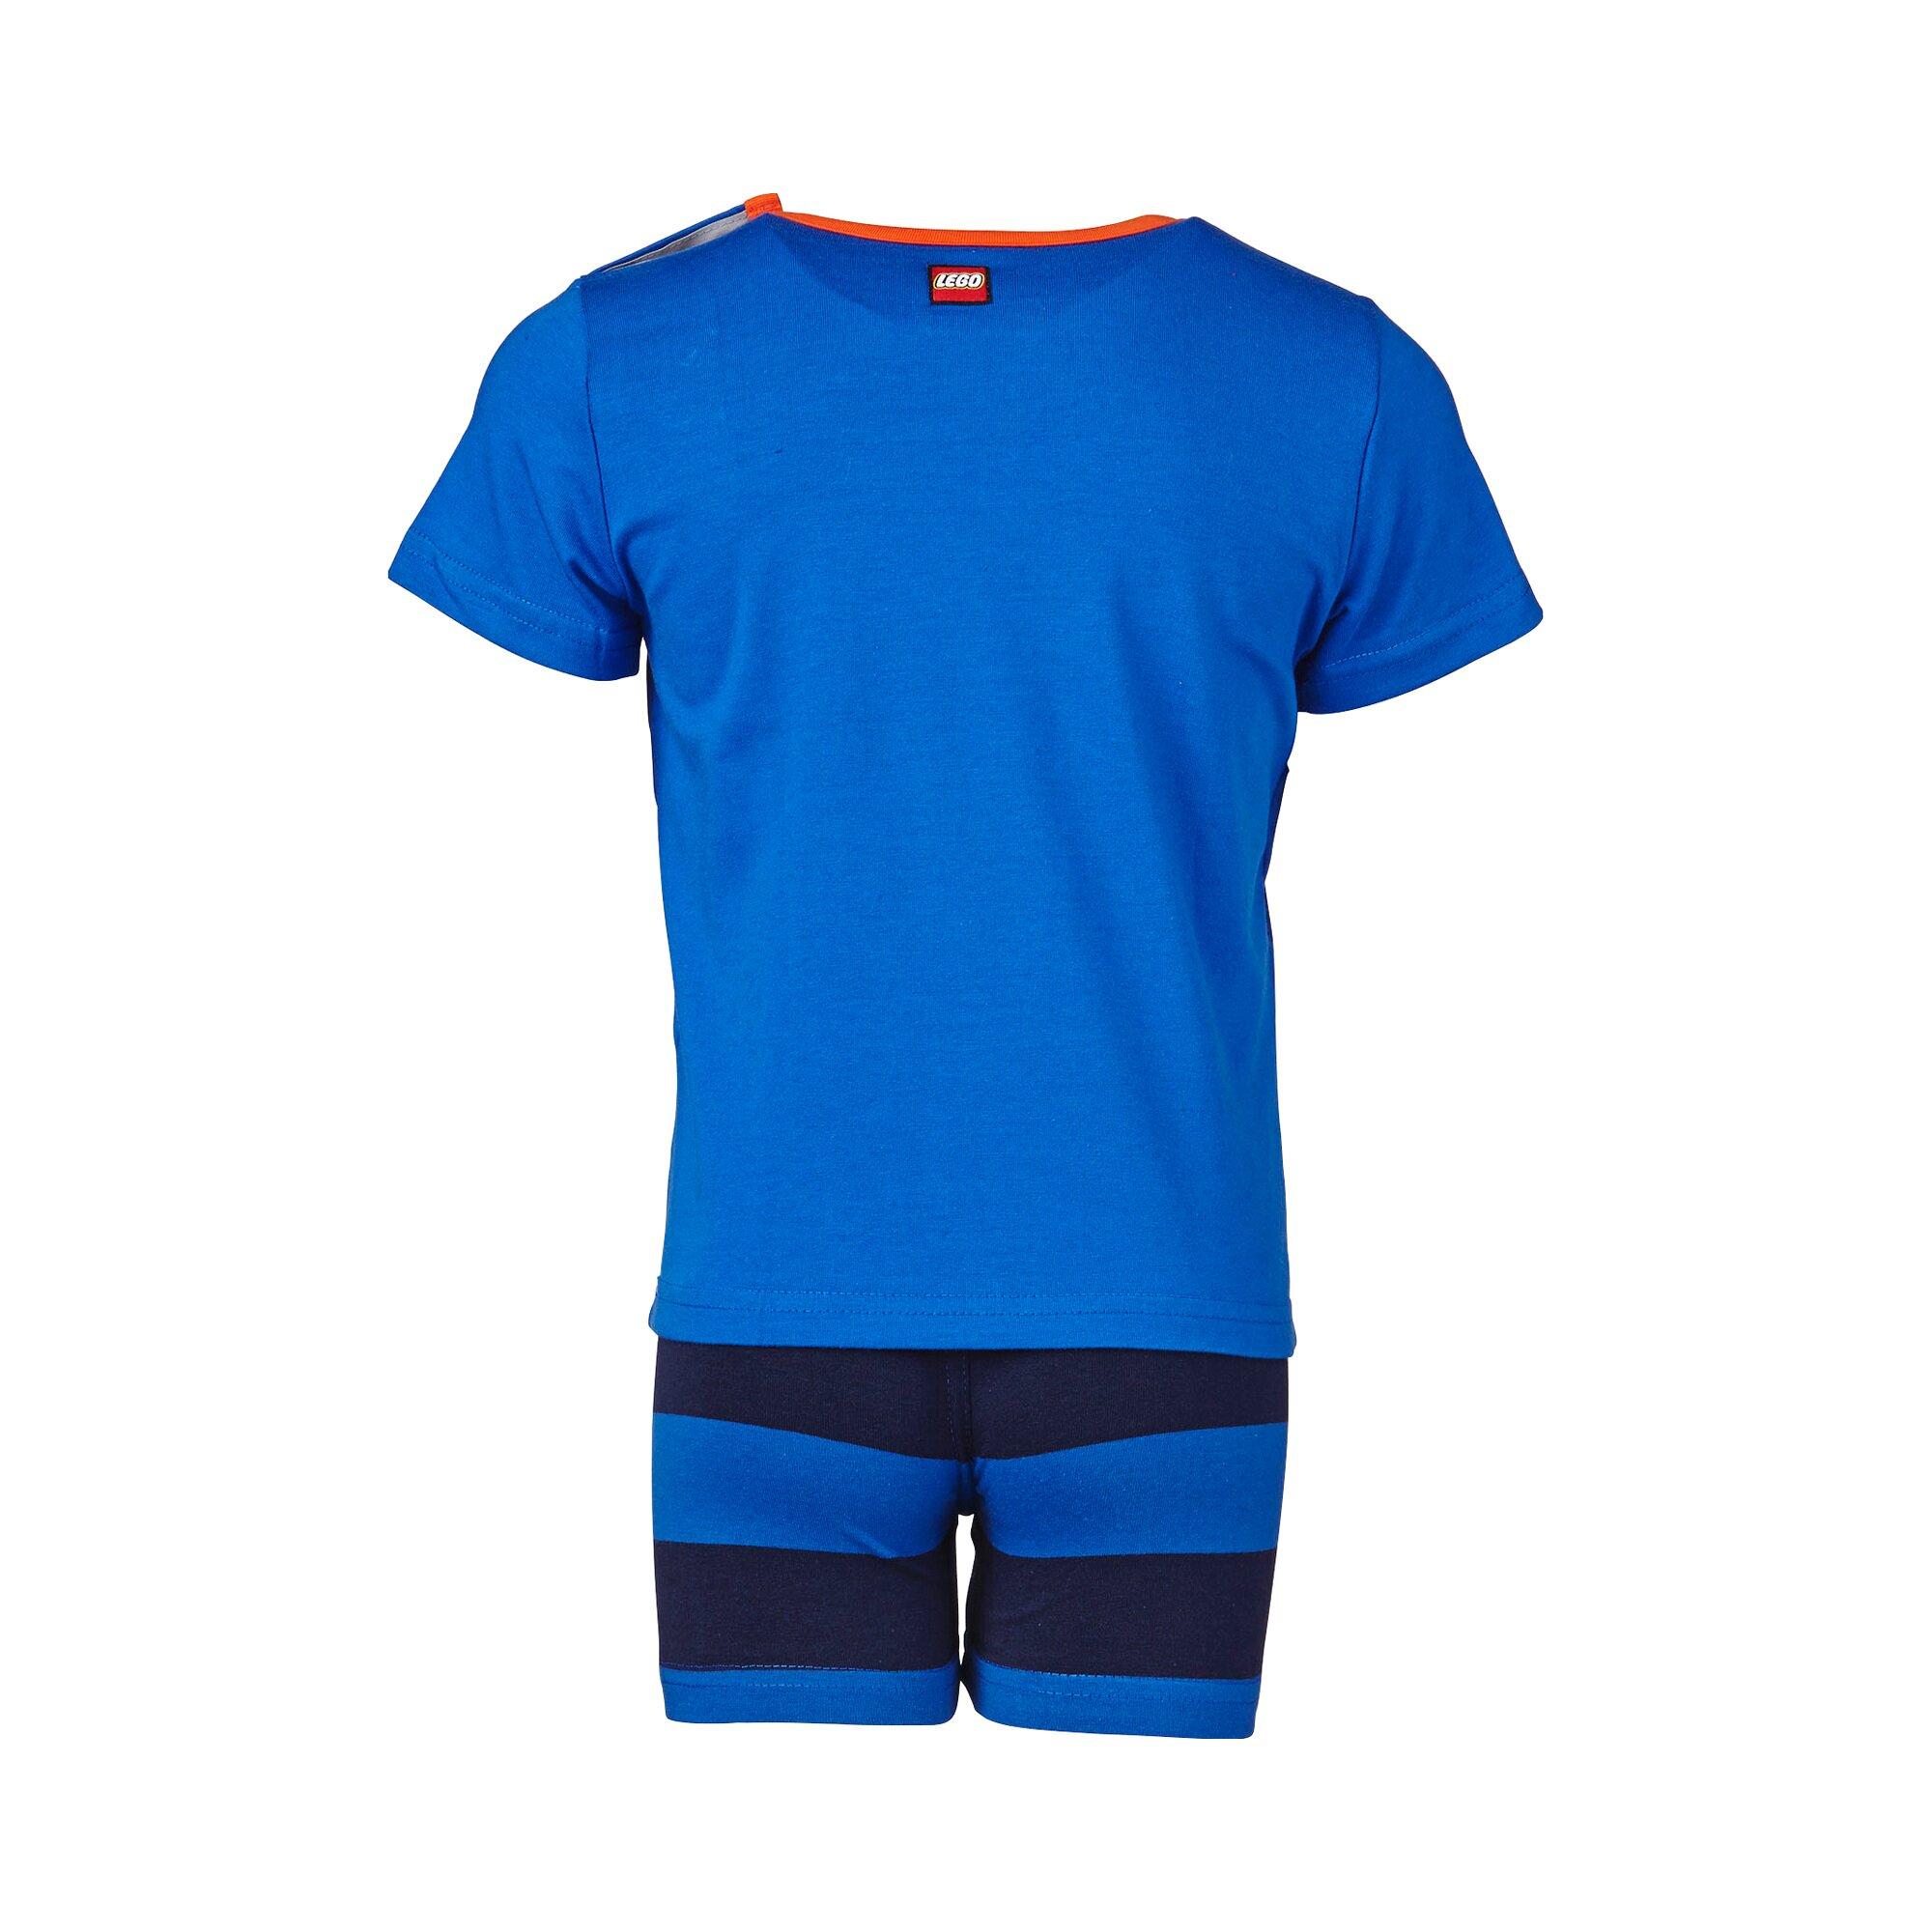 duplo-schlafanzug-kurz-aske